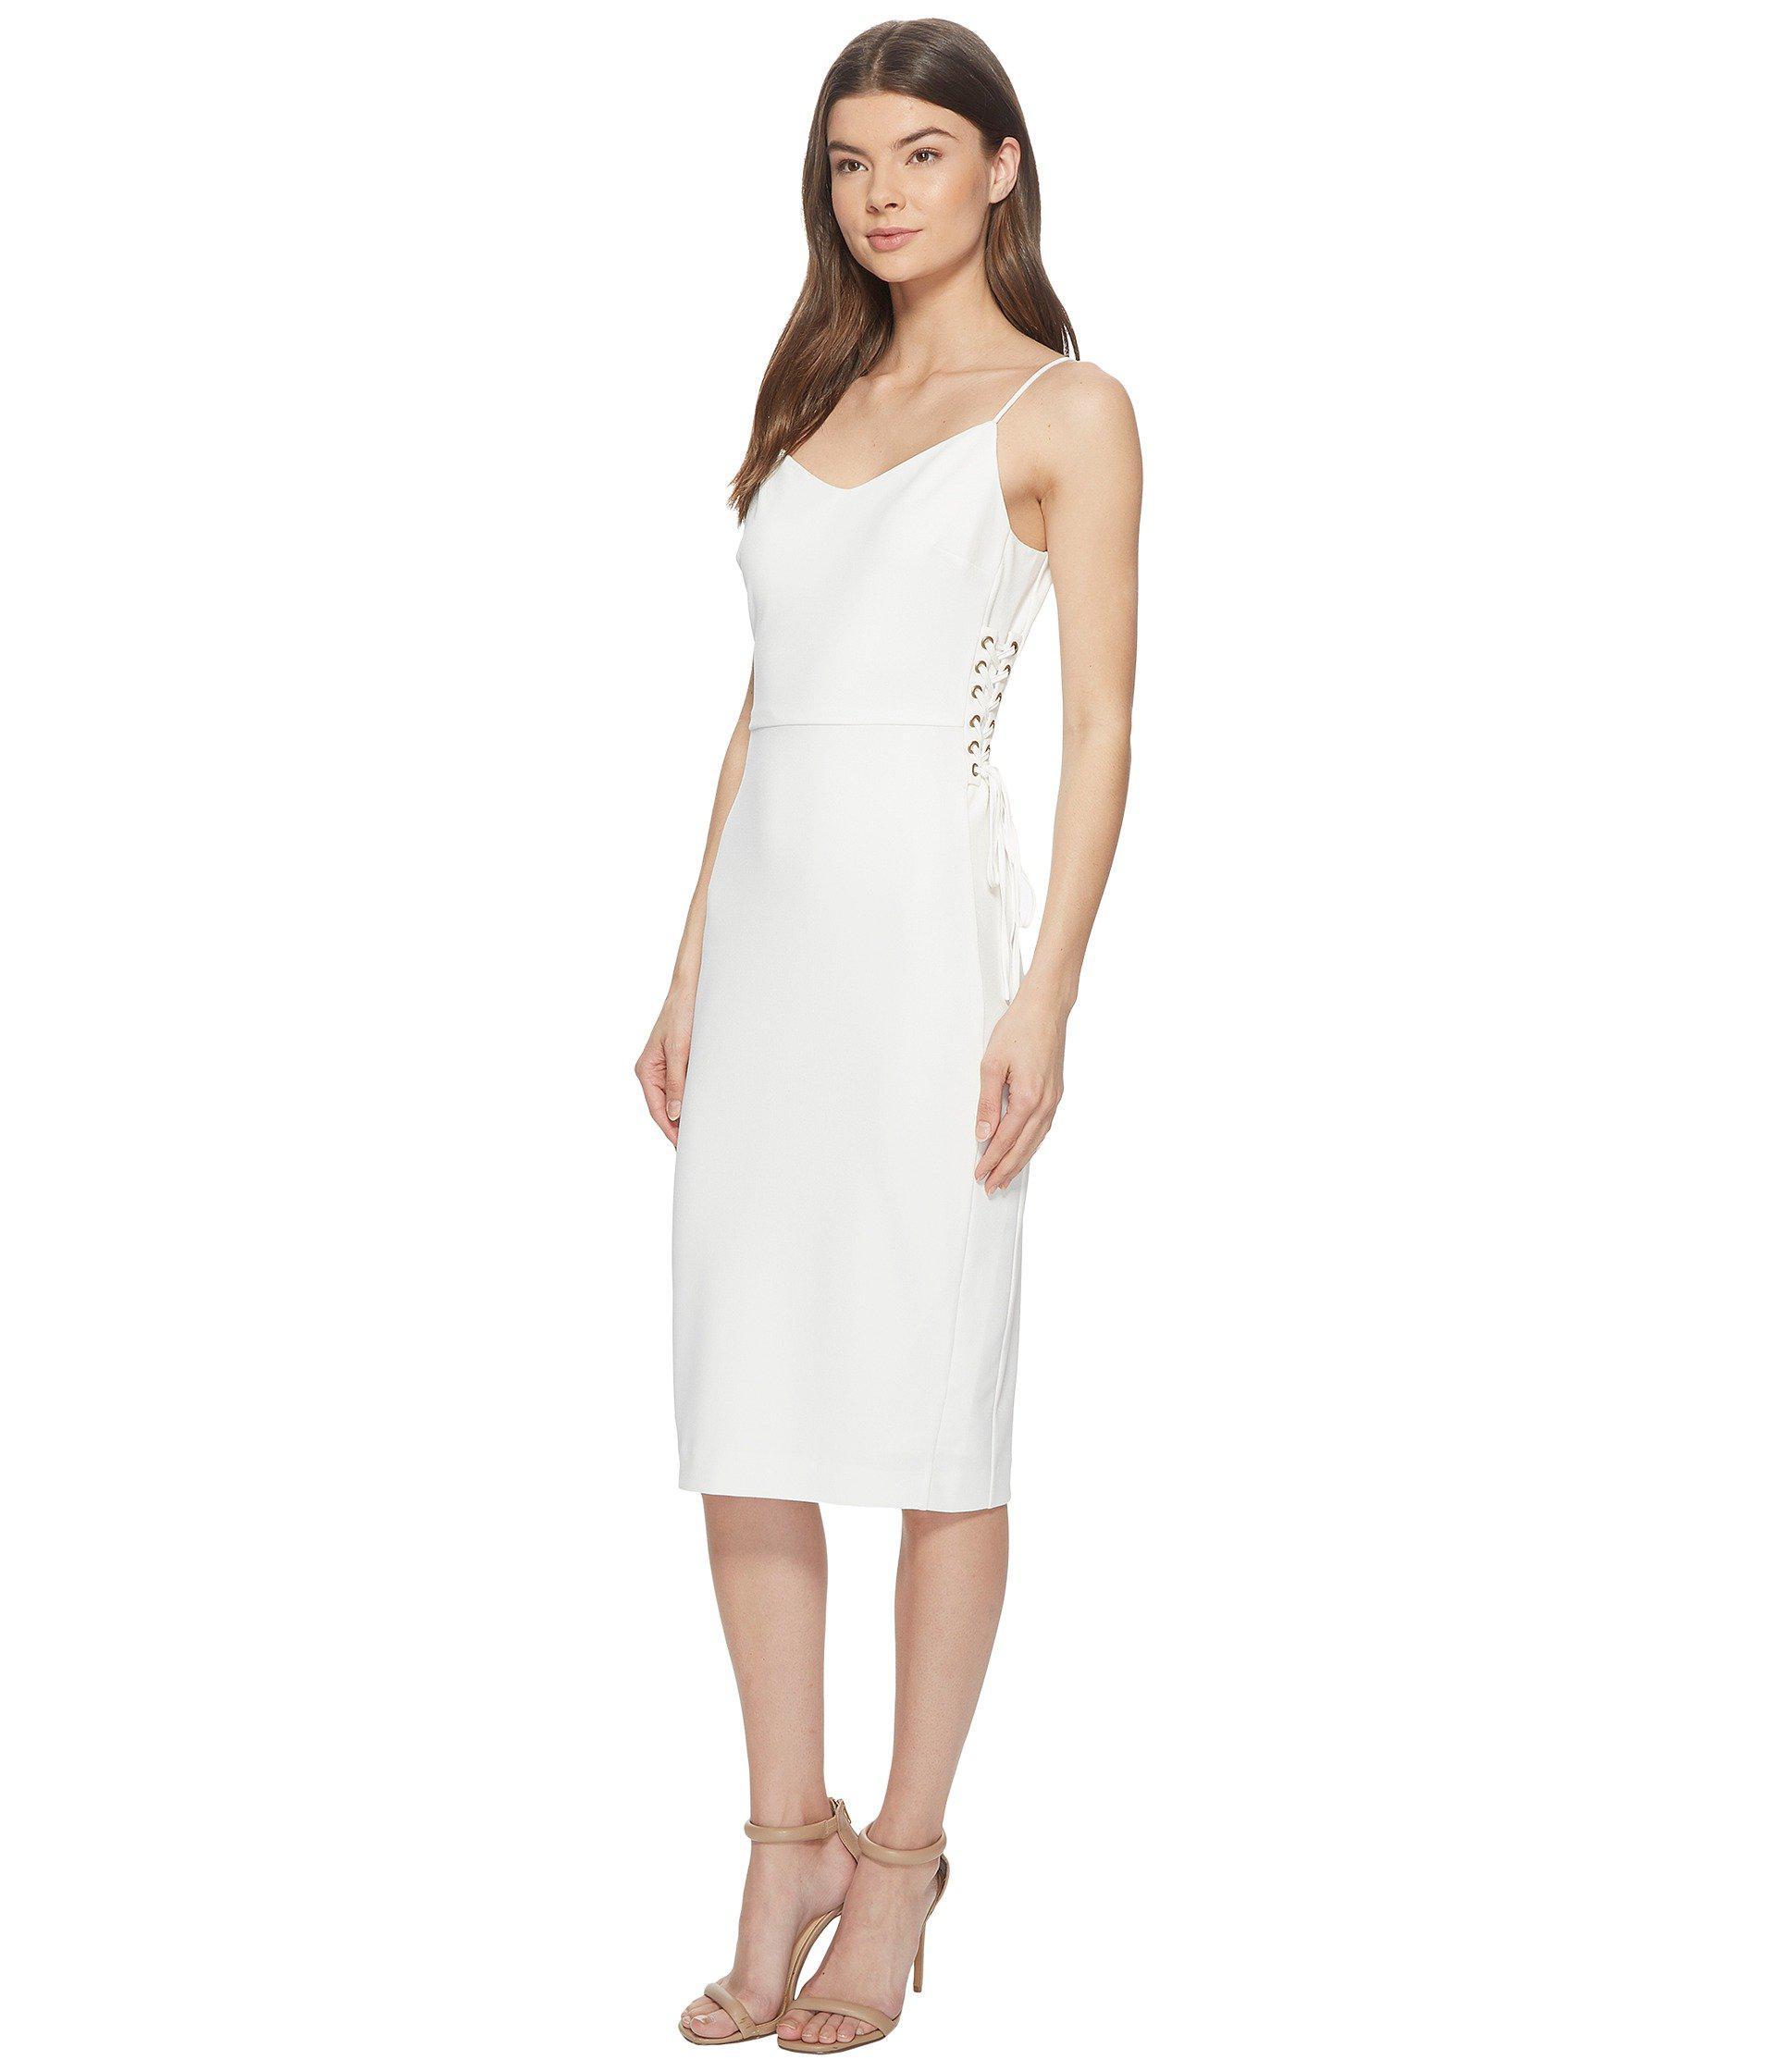 4e141db6d4a5 Lyst - 1.STATE Spaghetti Strap Slip Dress W  Lace-up in White - Save 35%